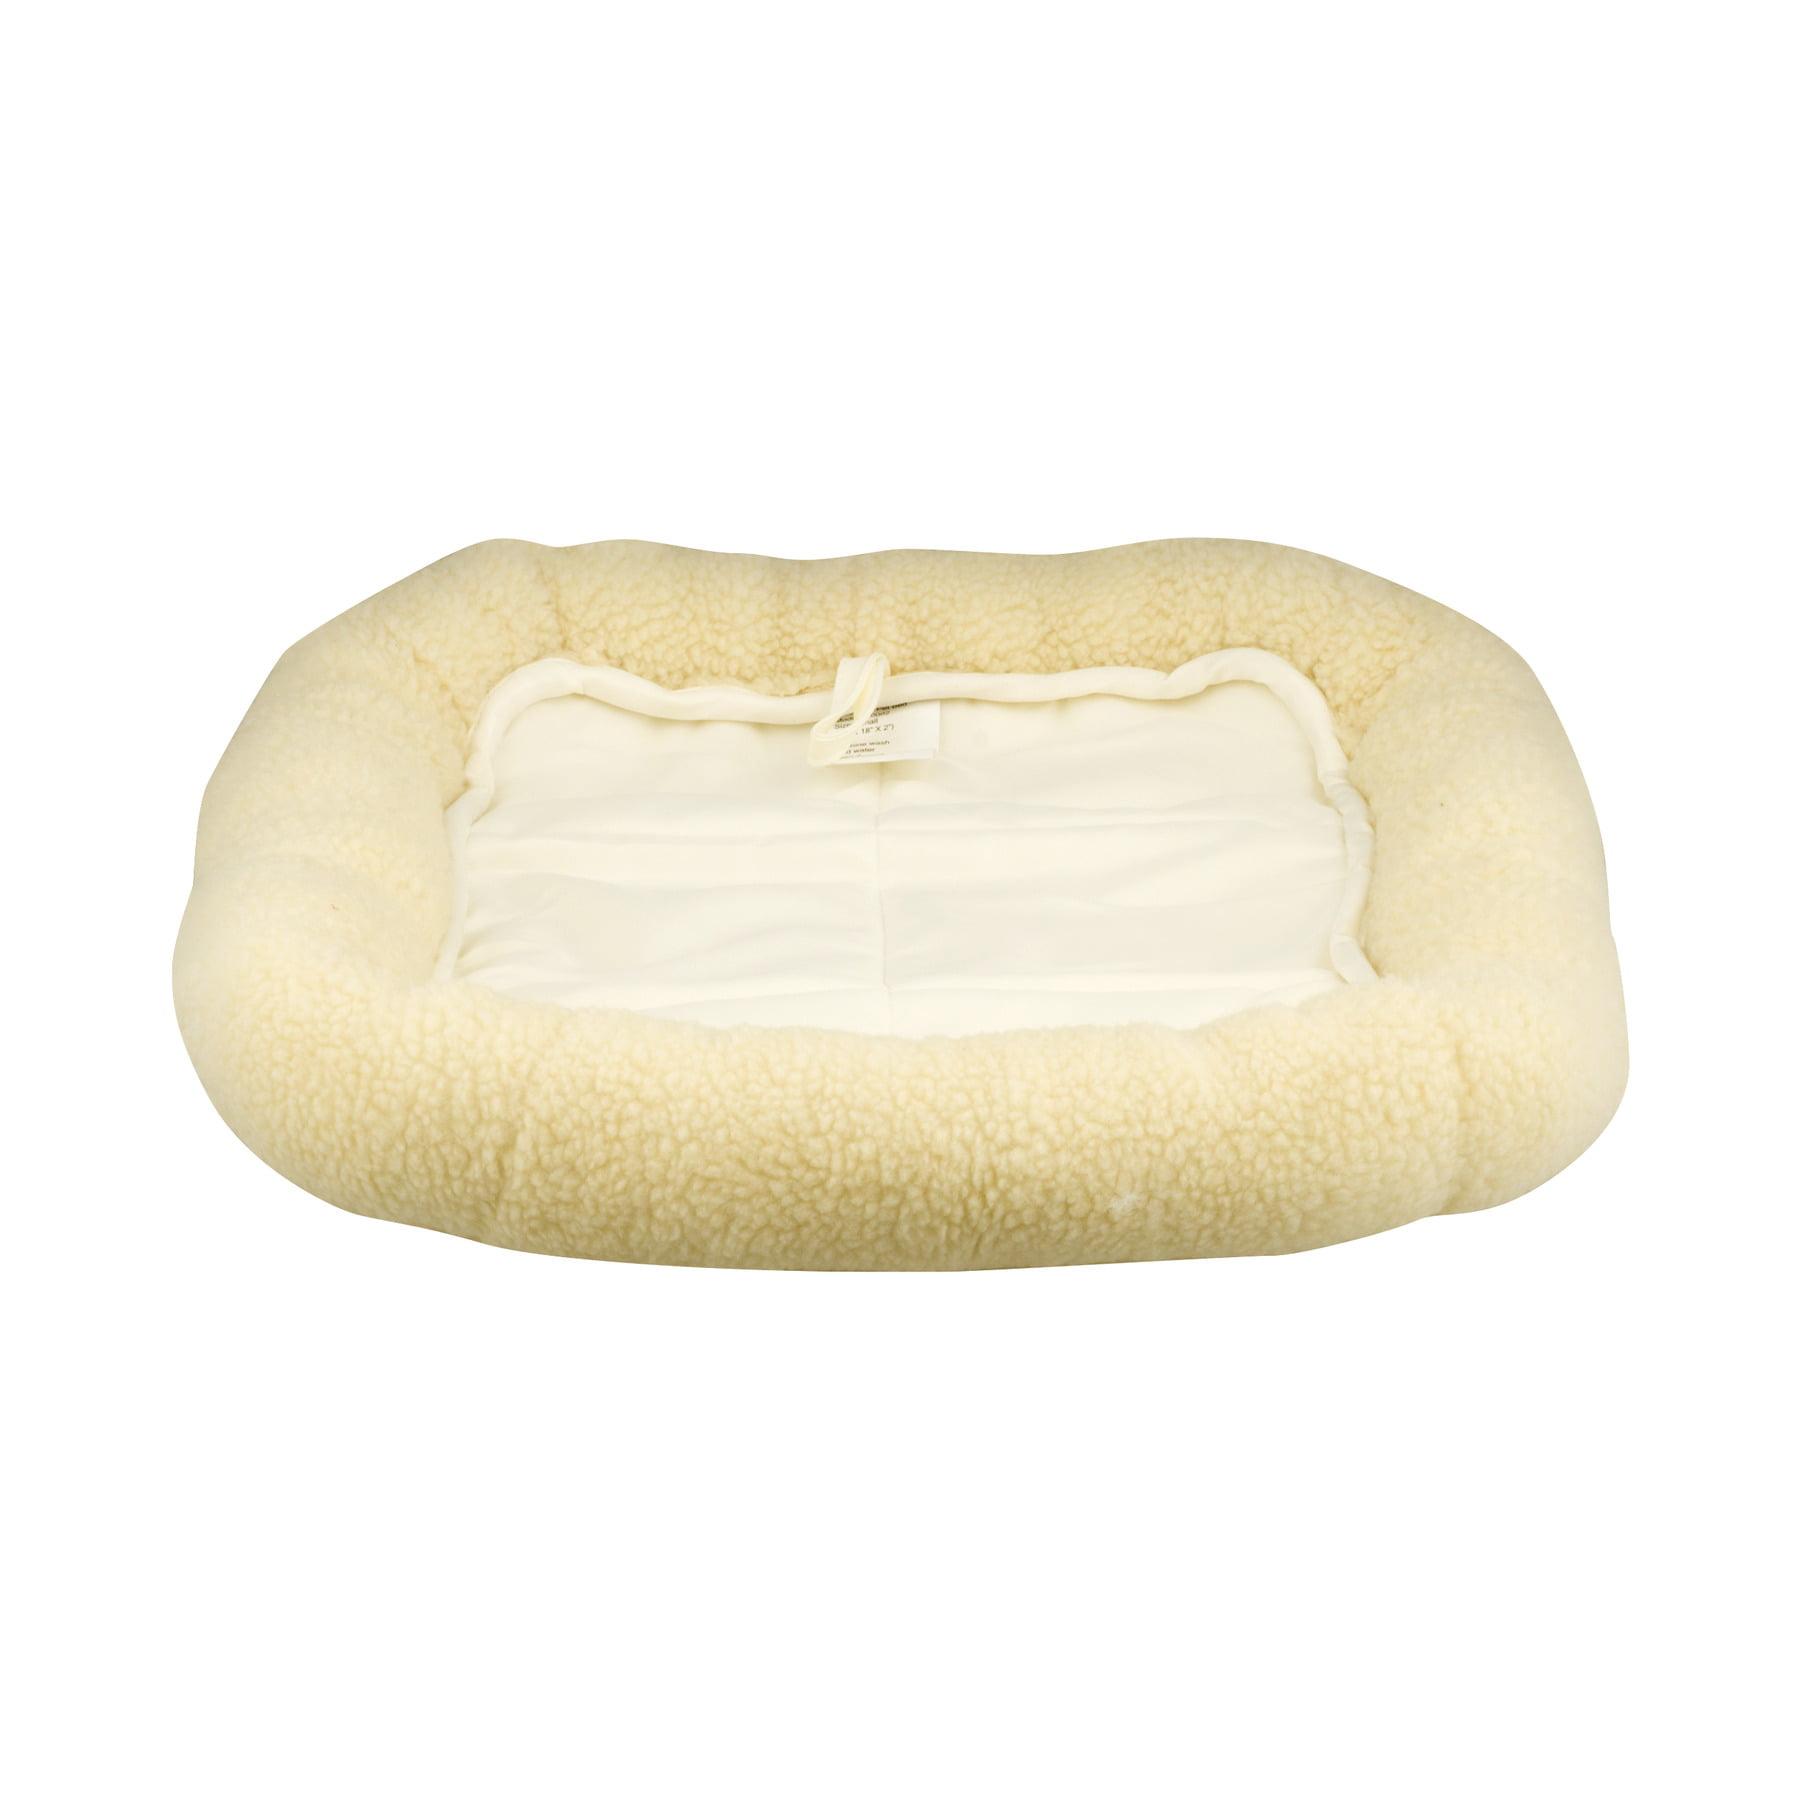 Carlson Fleece Machine Washable Pet Bed, 1.0 CT